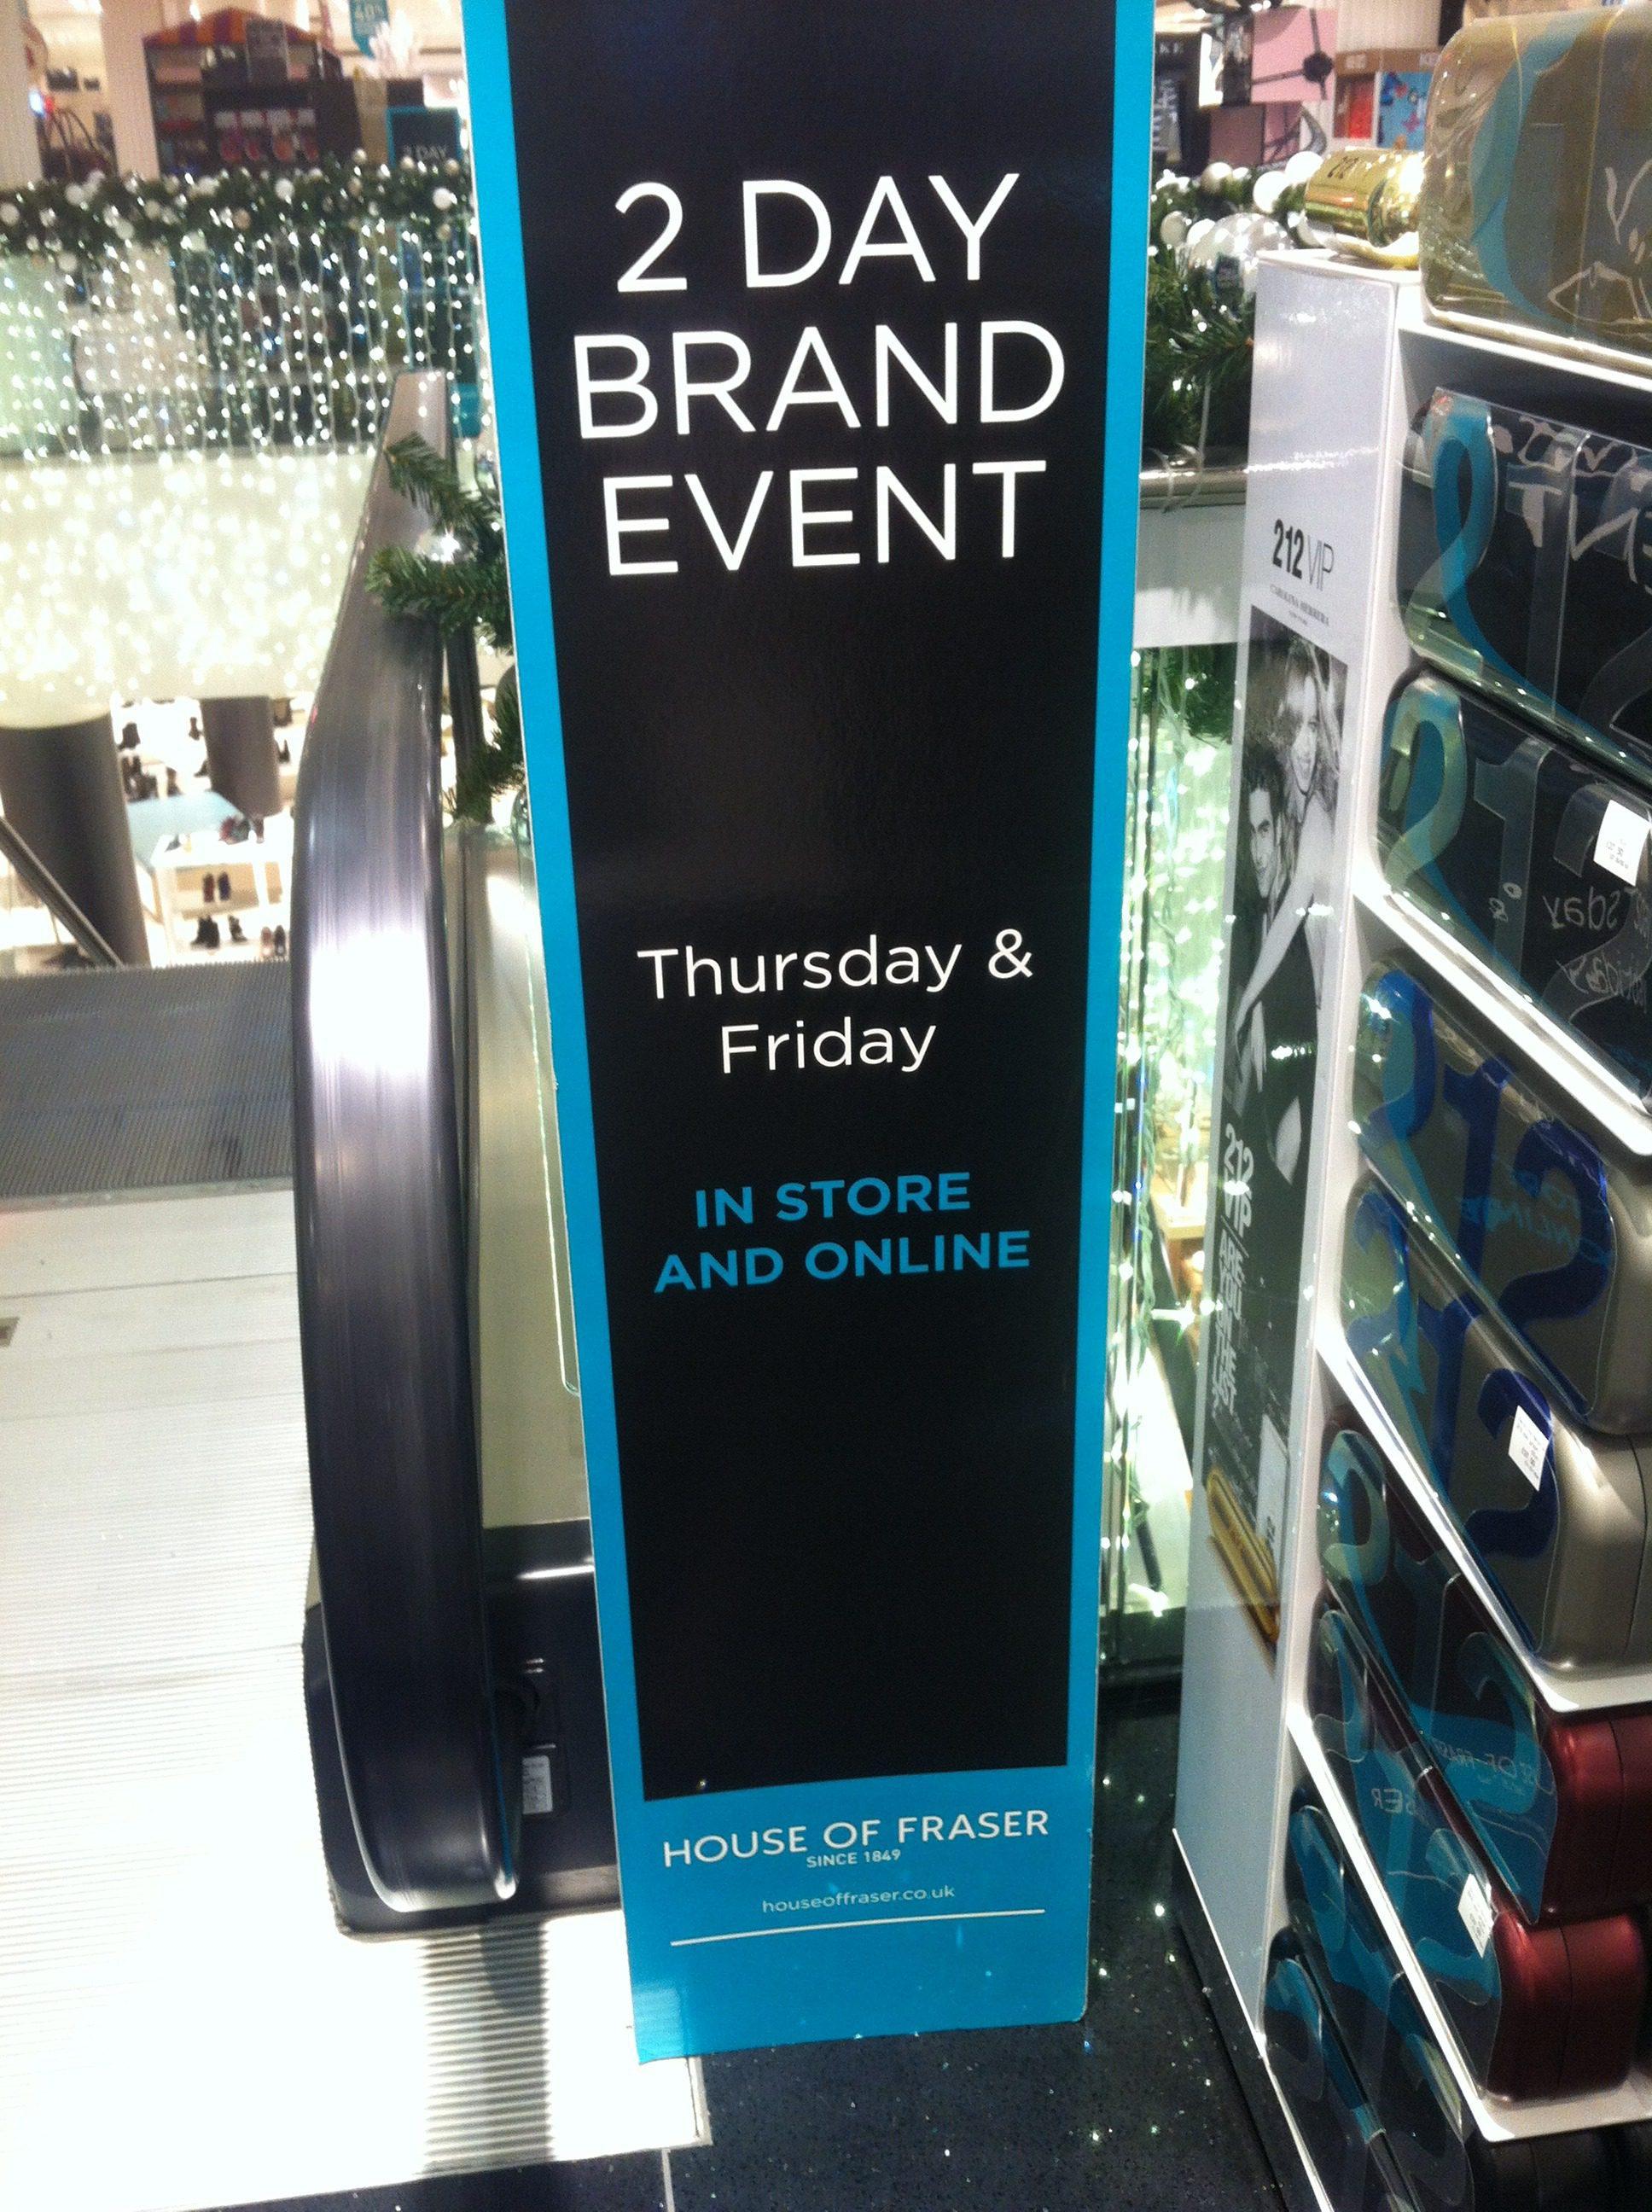 House of Fraser entrance, The Myndset Brand Strategy and Digital Marketing